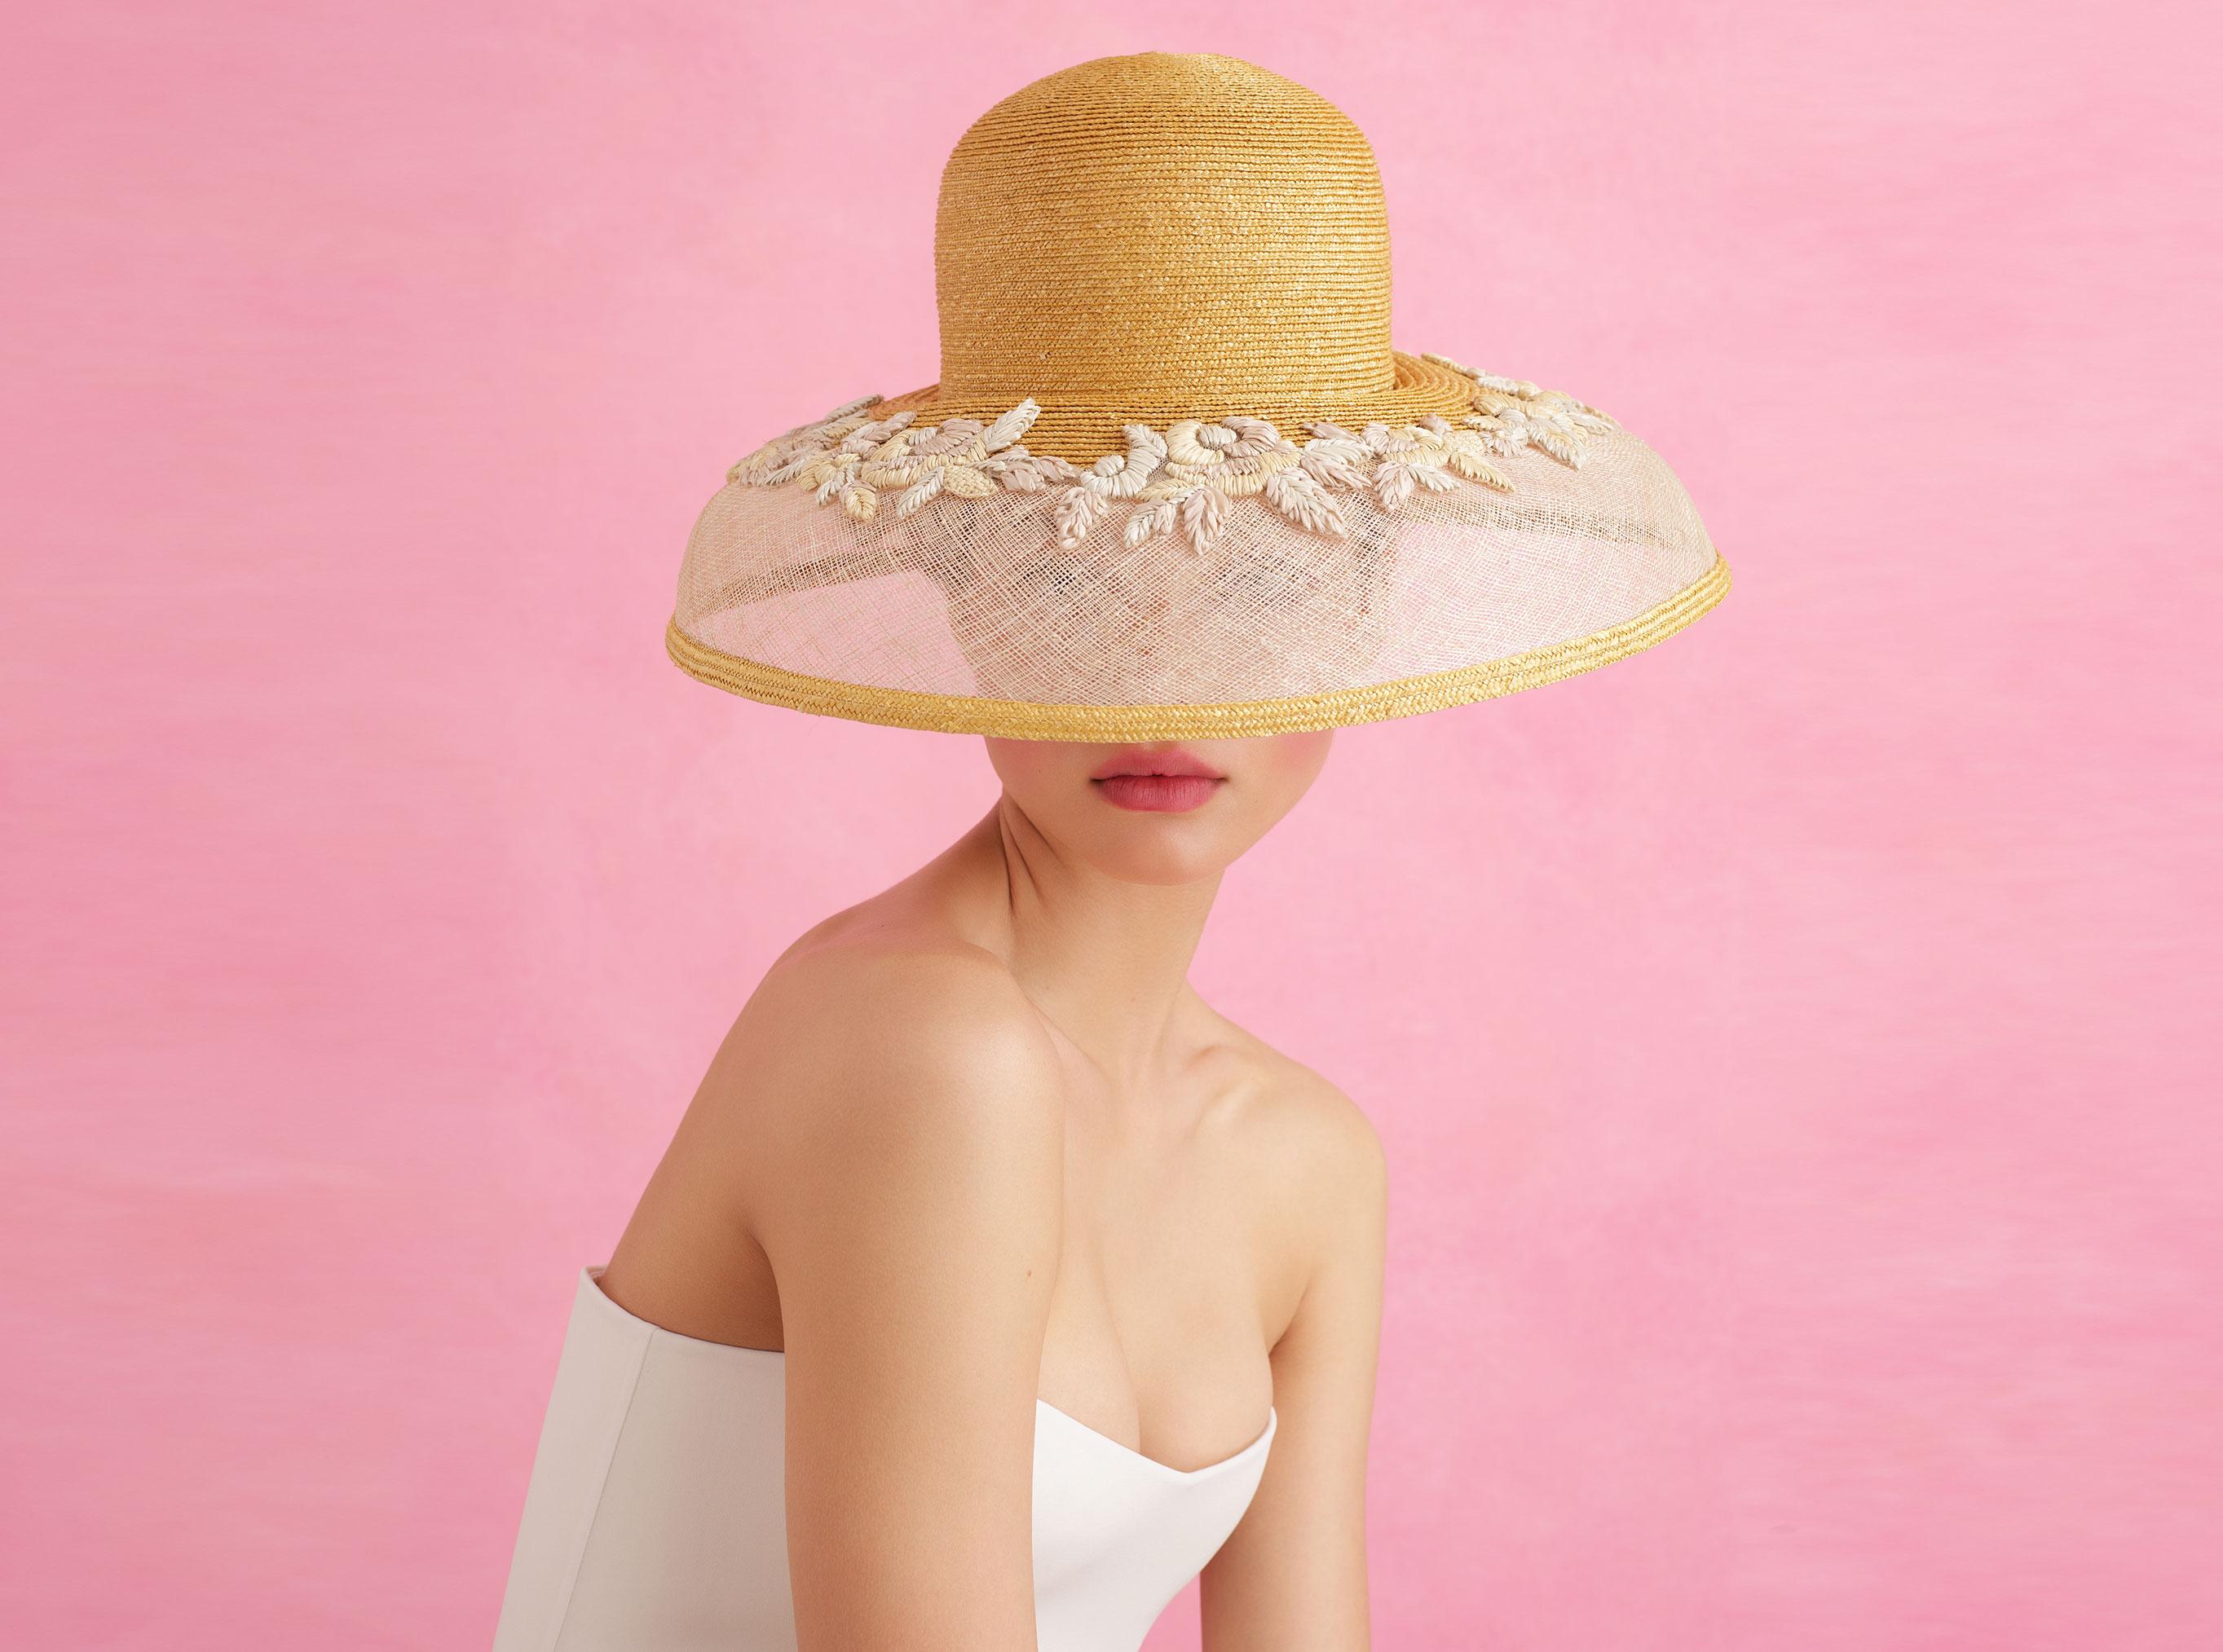 Модная коллекция бренда Ulyana Sergeenko, сезон весна-лето 2018 / фото 01